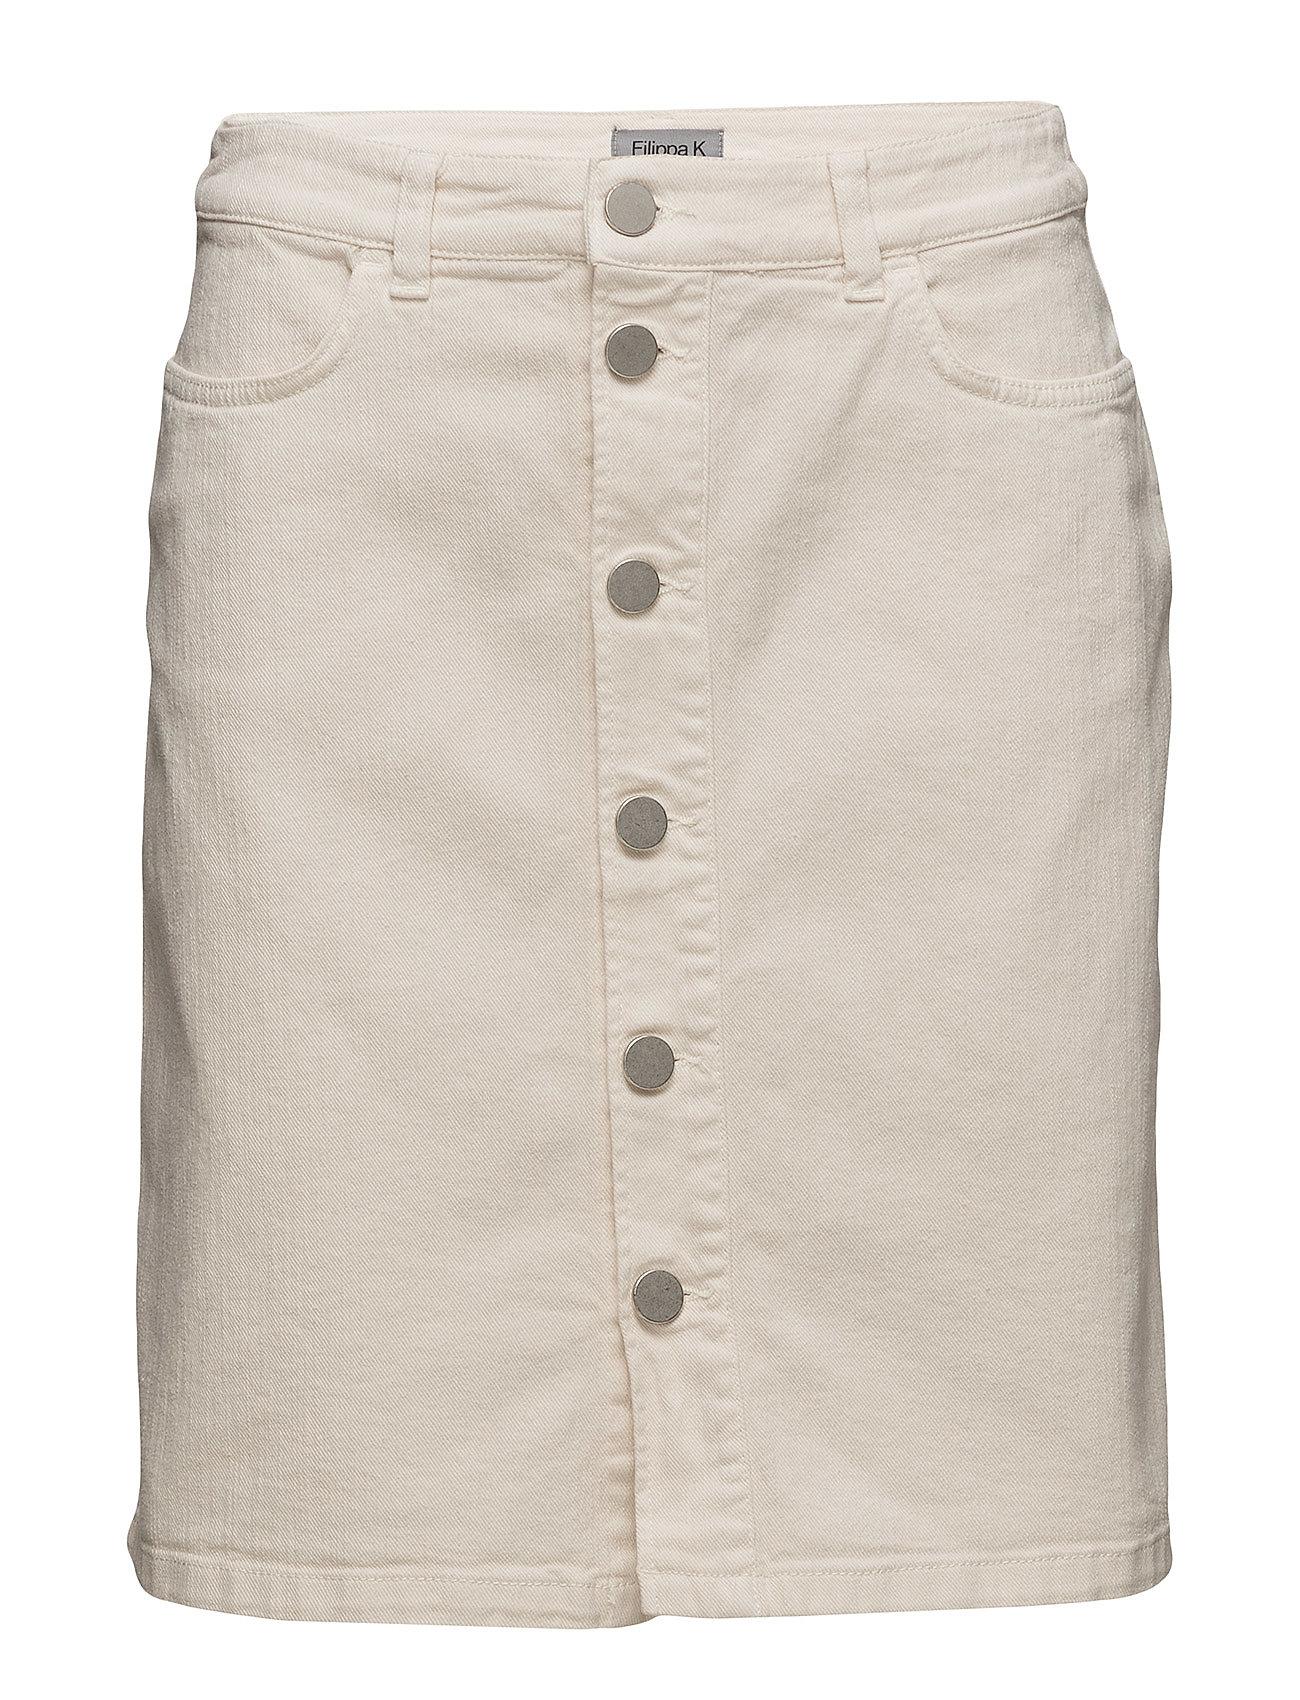 Image of Ecru Denim Skirt Skirts Hvid Filippa K (3433036833)